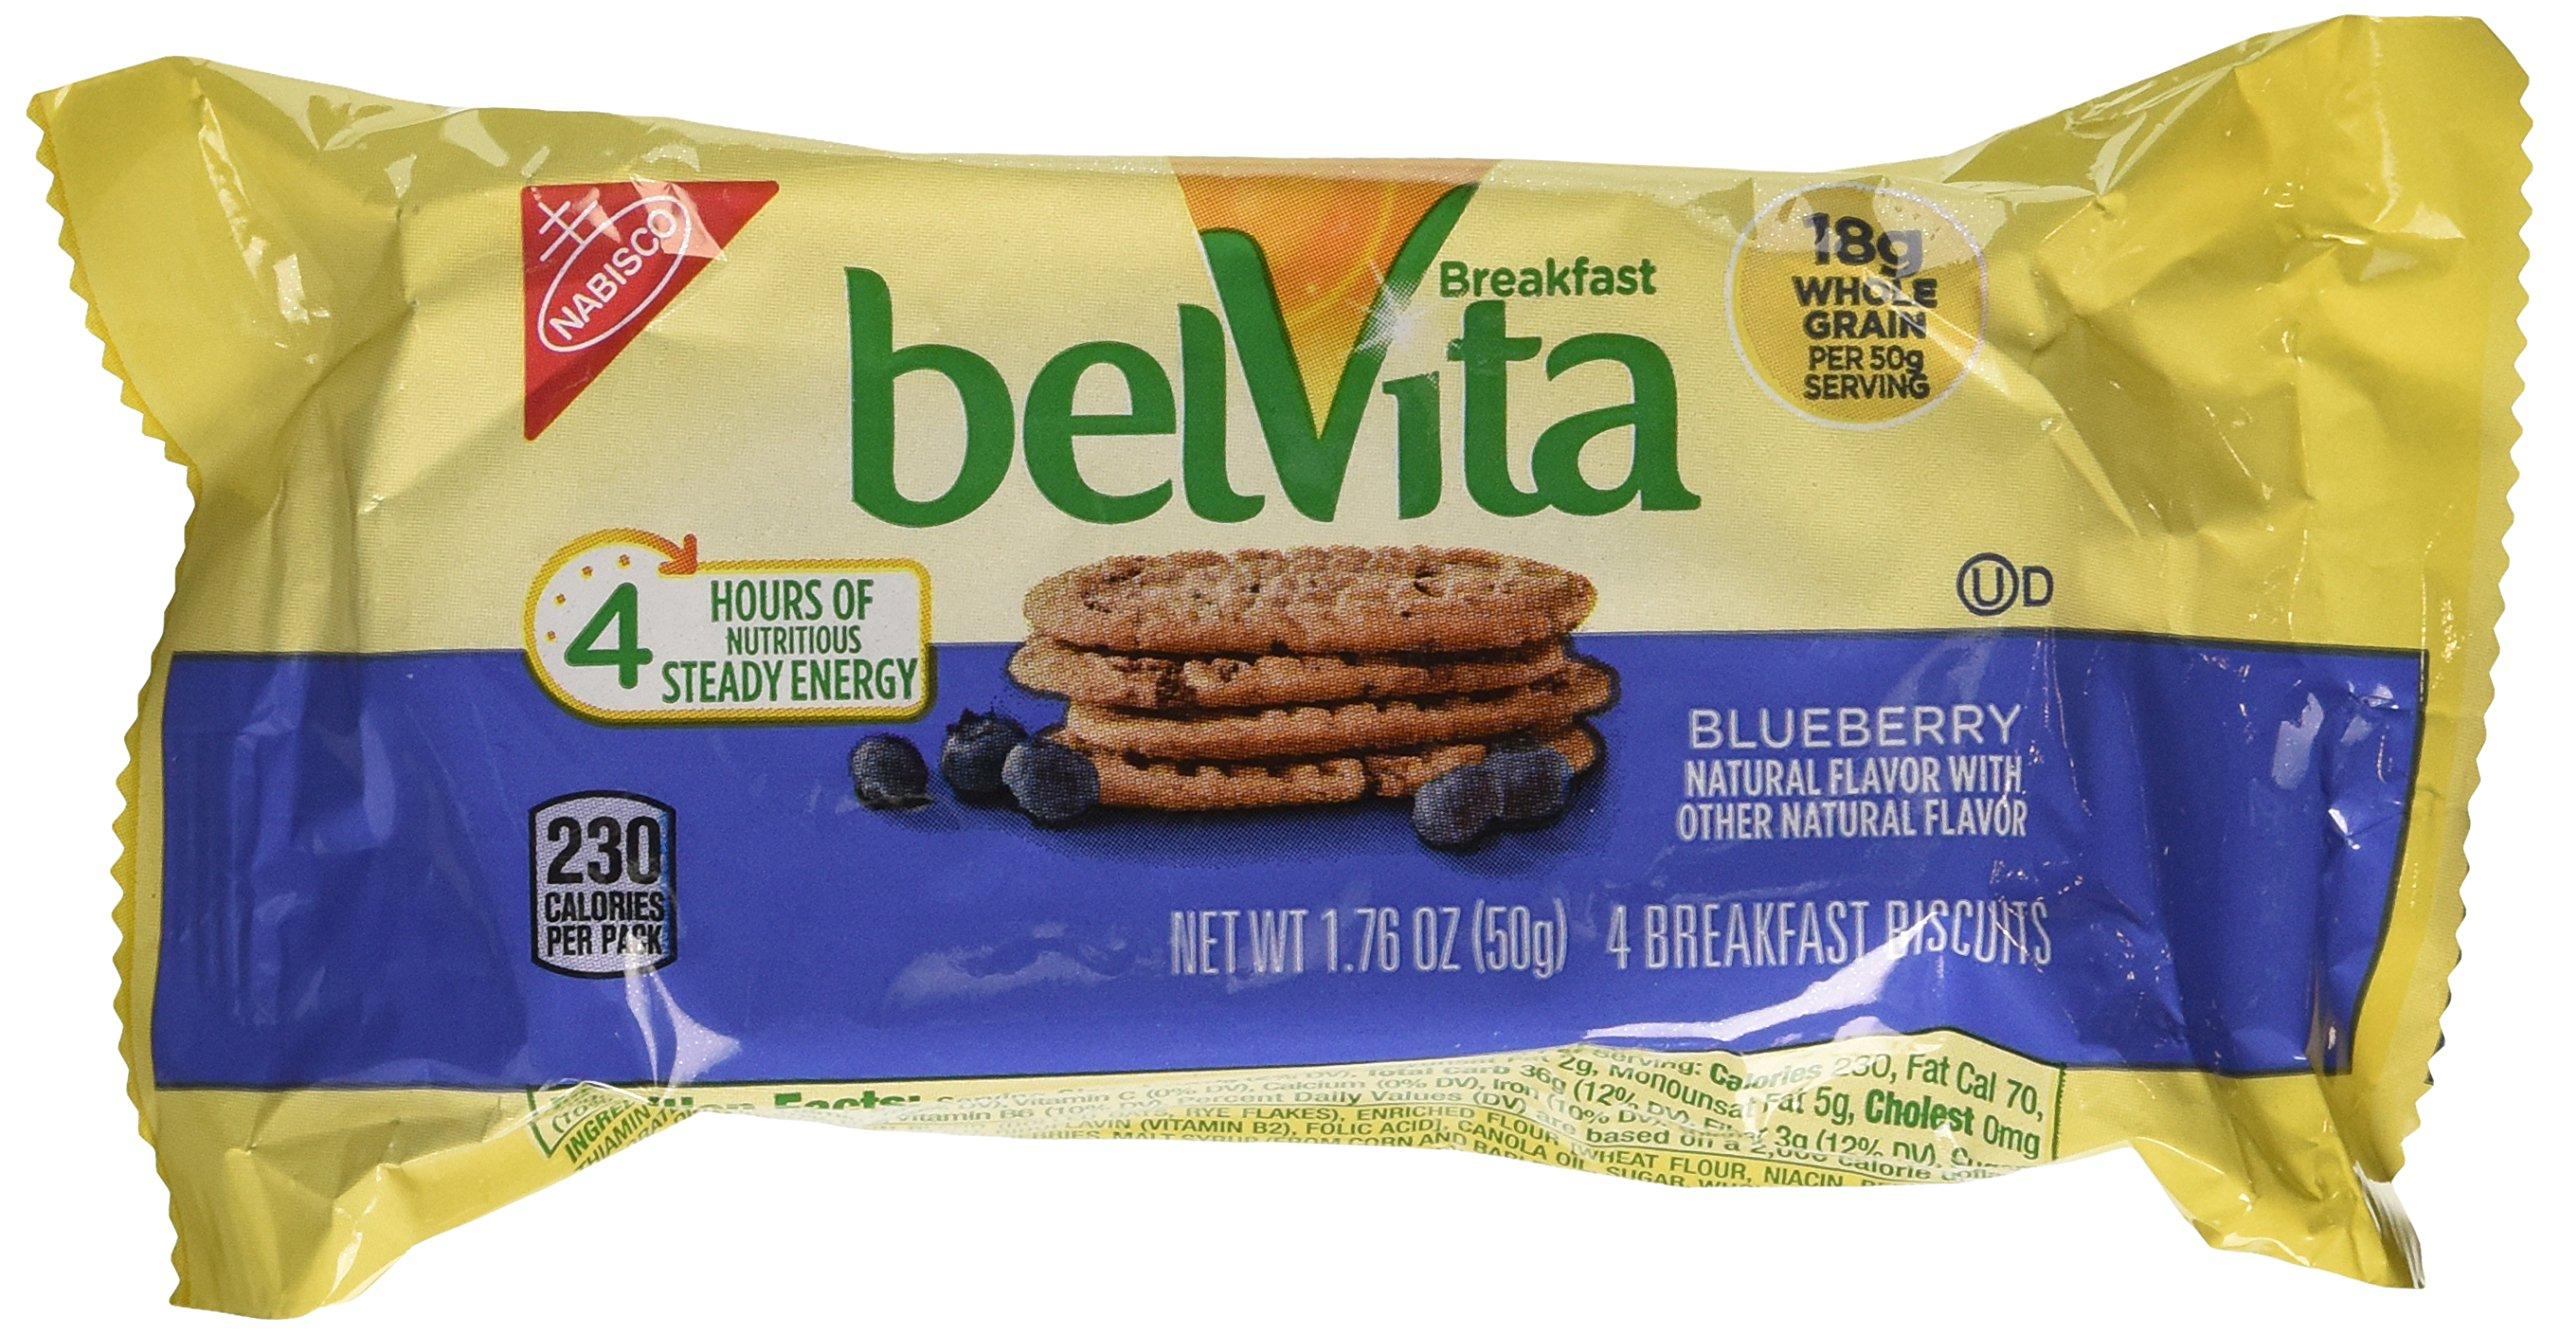 Belvita Breakfast Biscuit, Blueberry 25-1.76 oz. 4 count packs